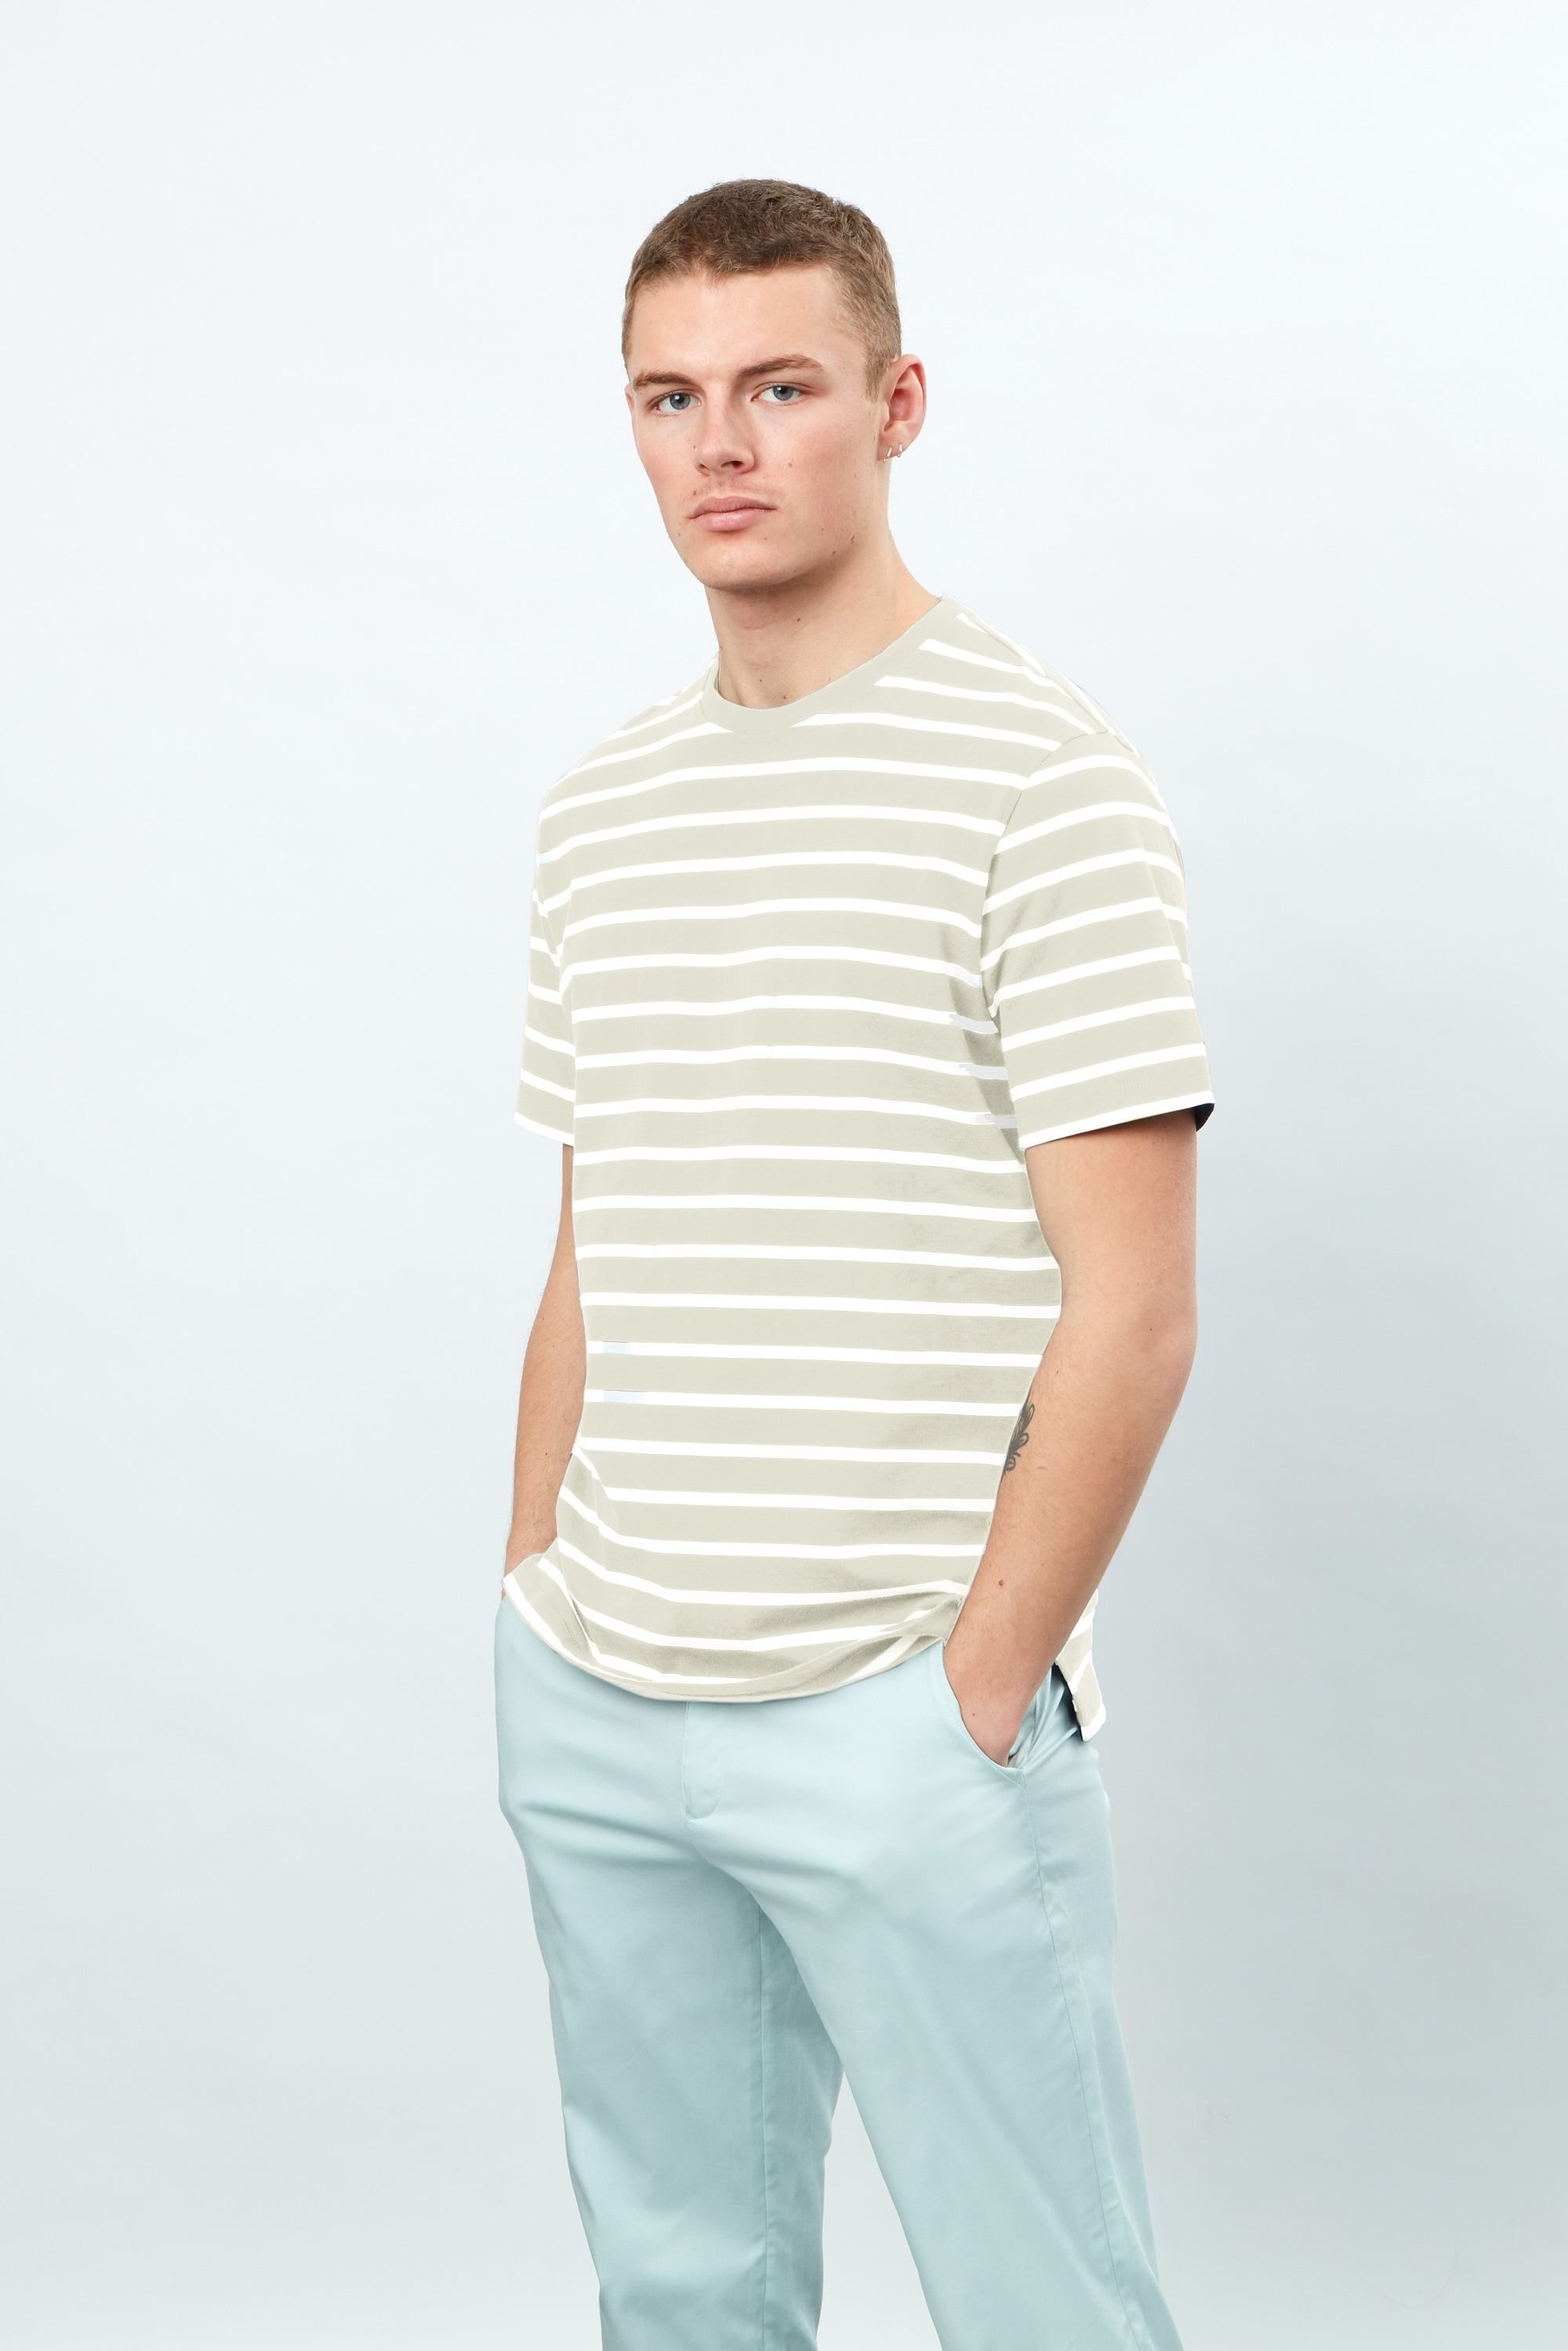 Short Sleeve YD Striped tee